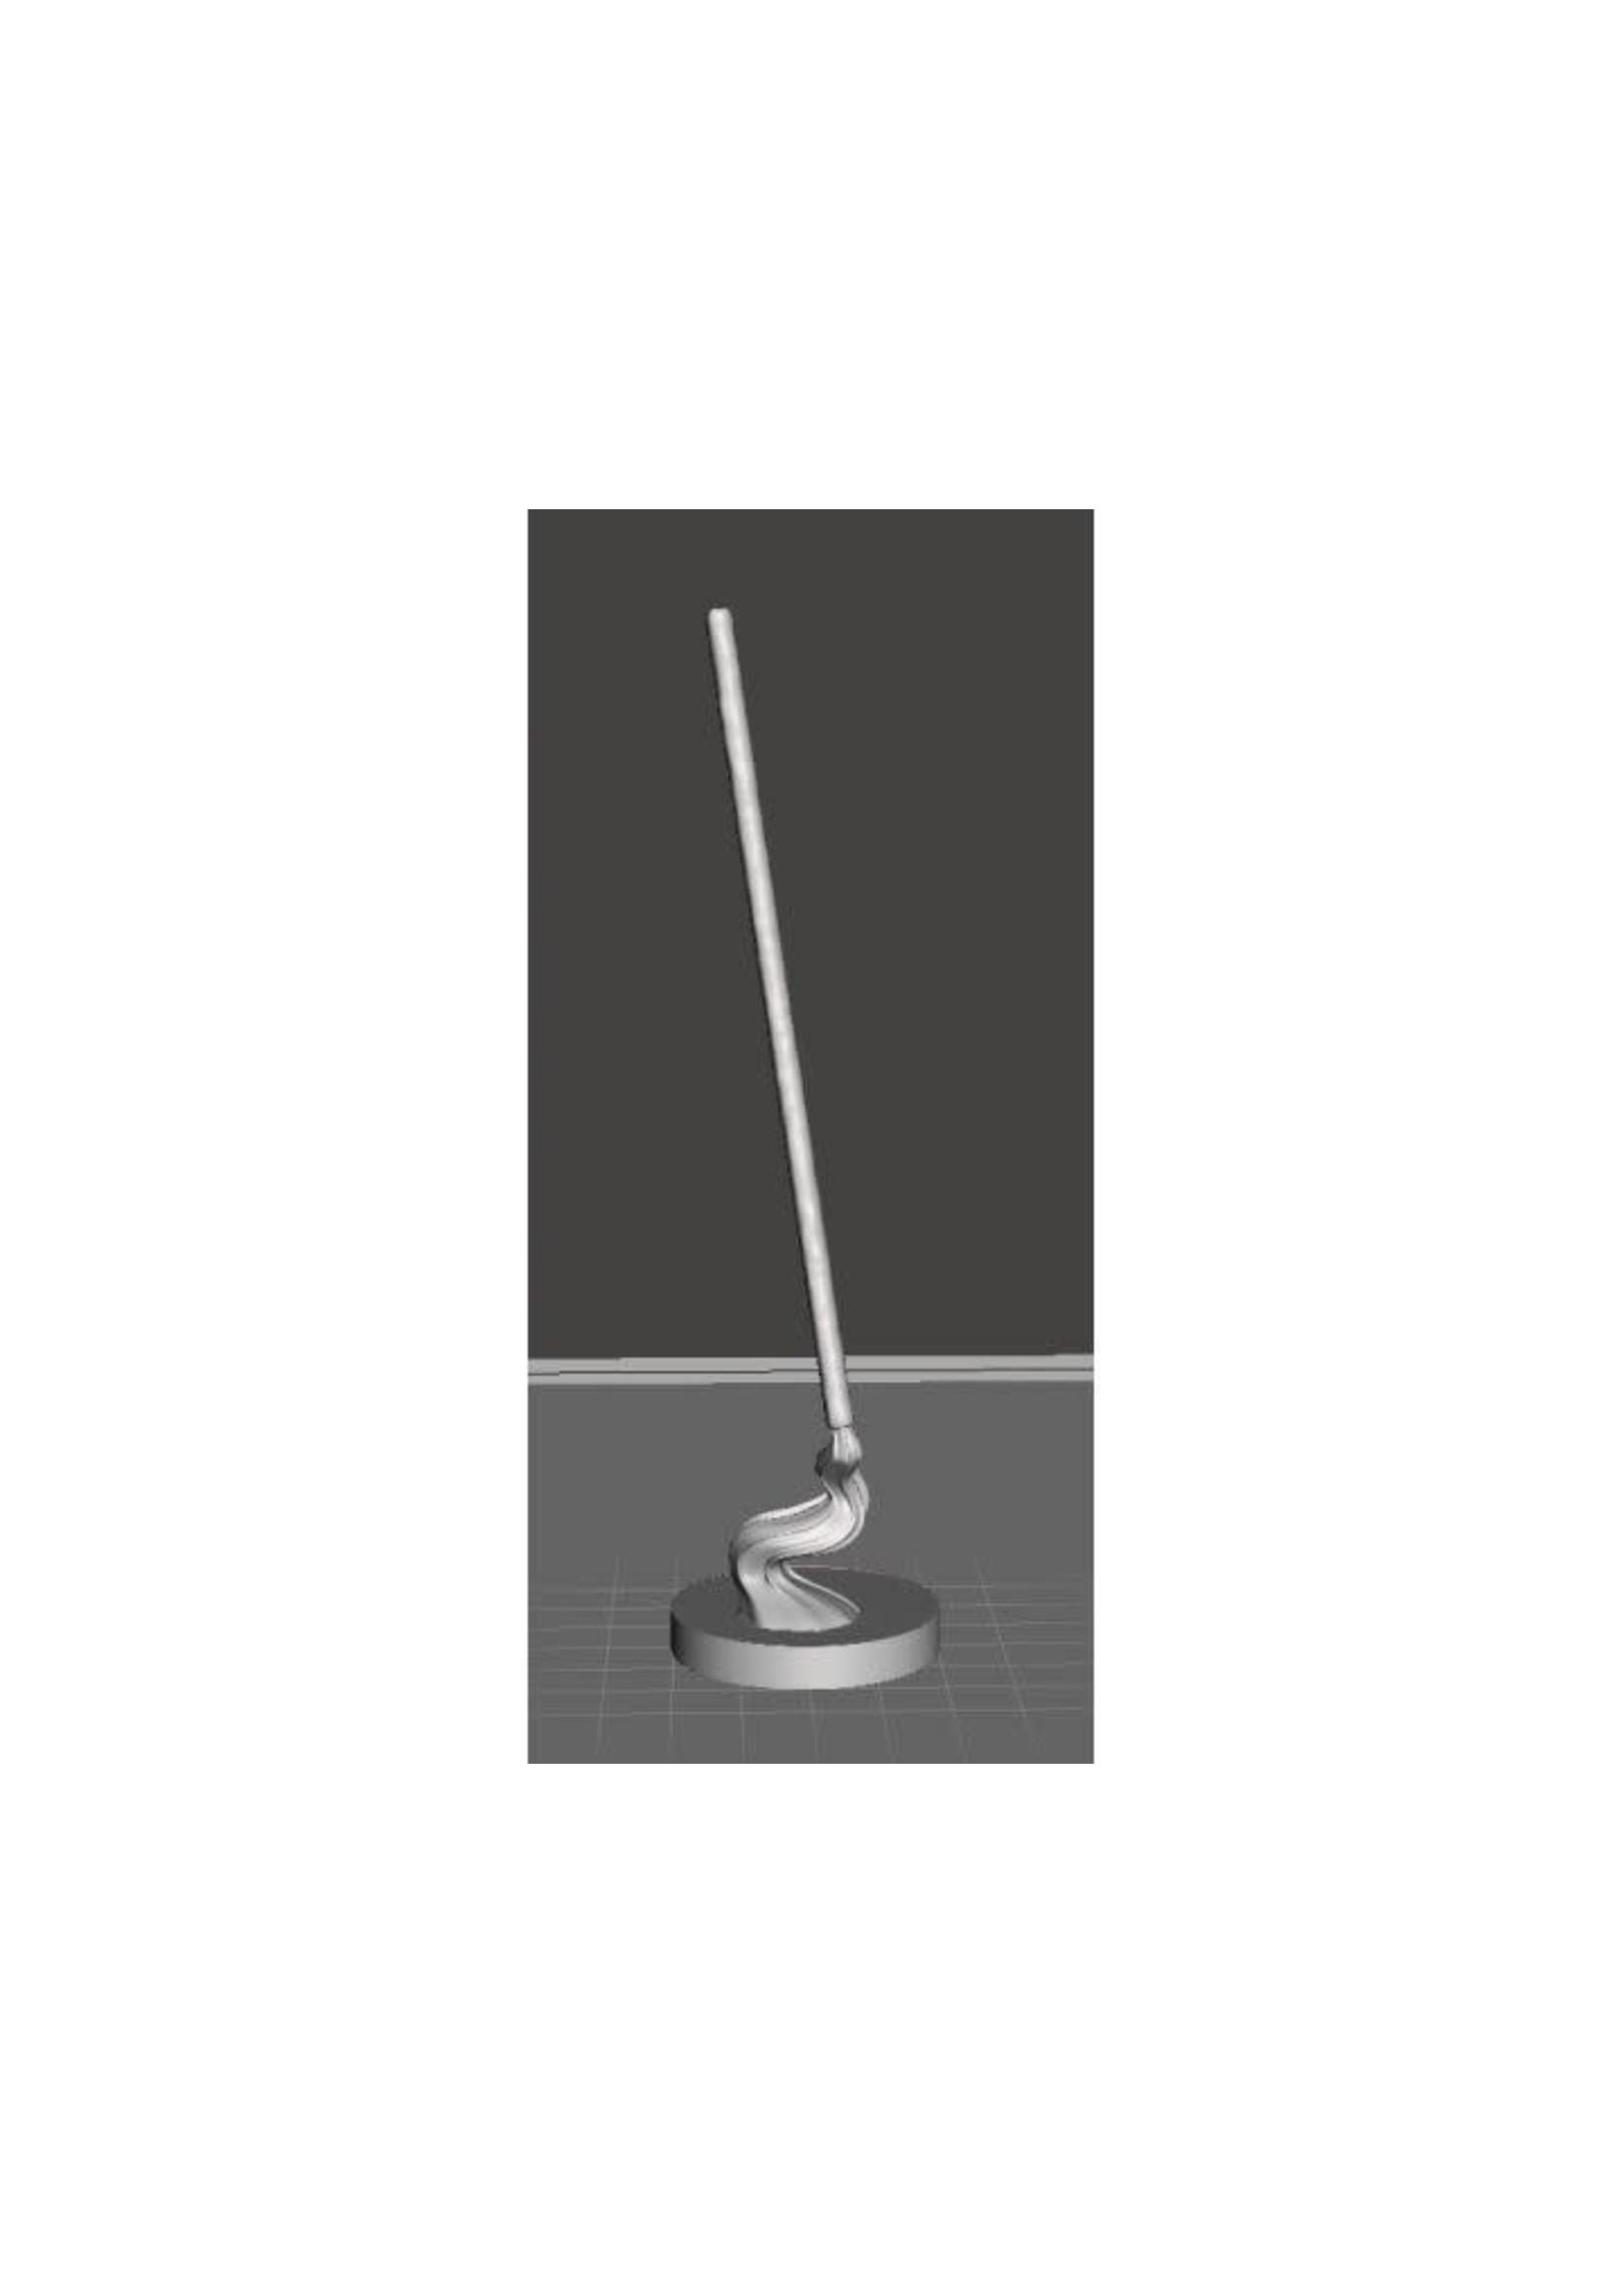 Animated Ten Foot Pole (Patreon Mz4250)